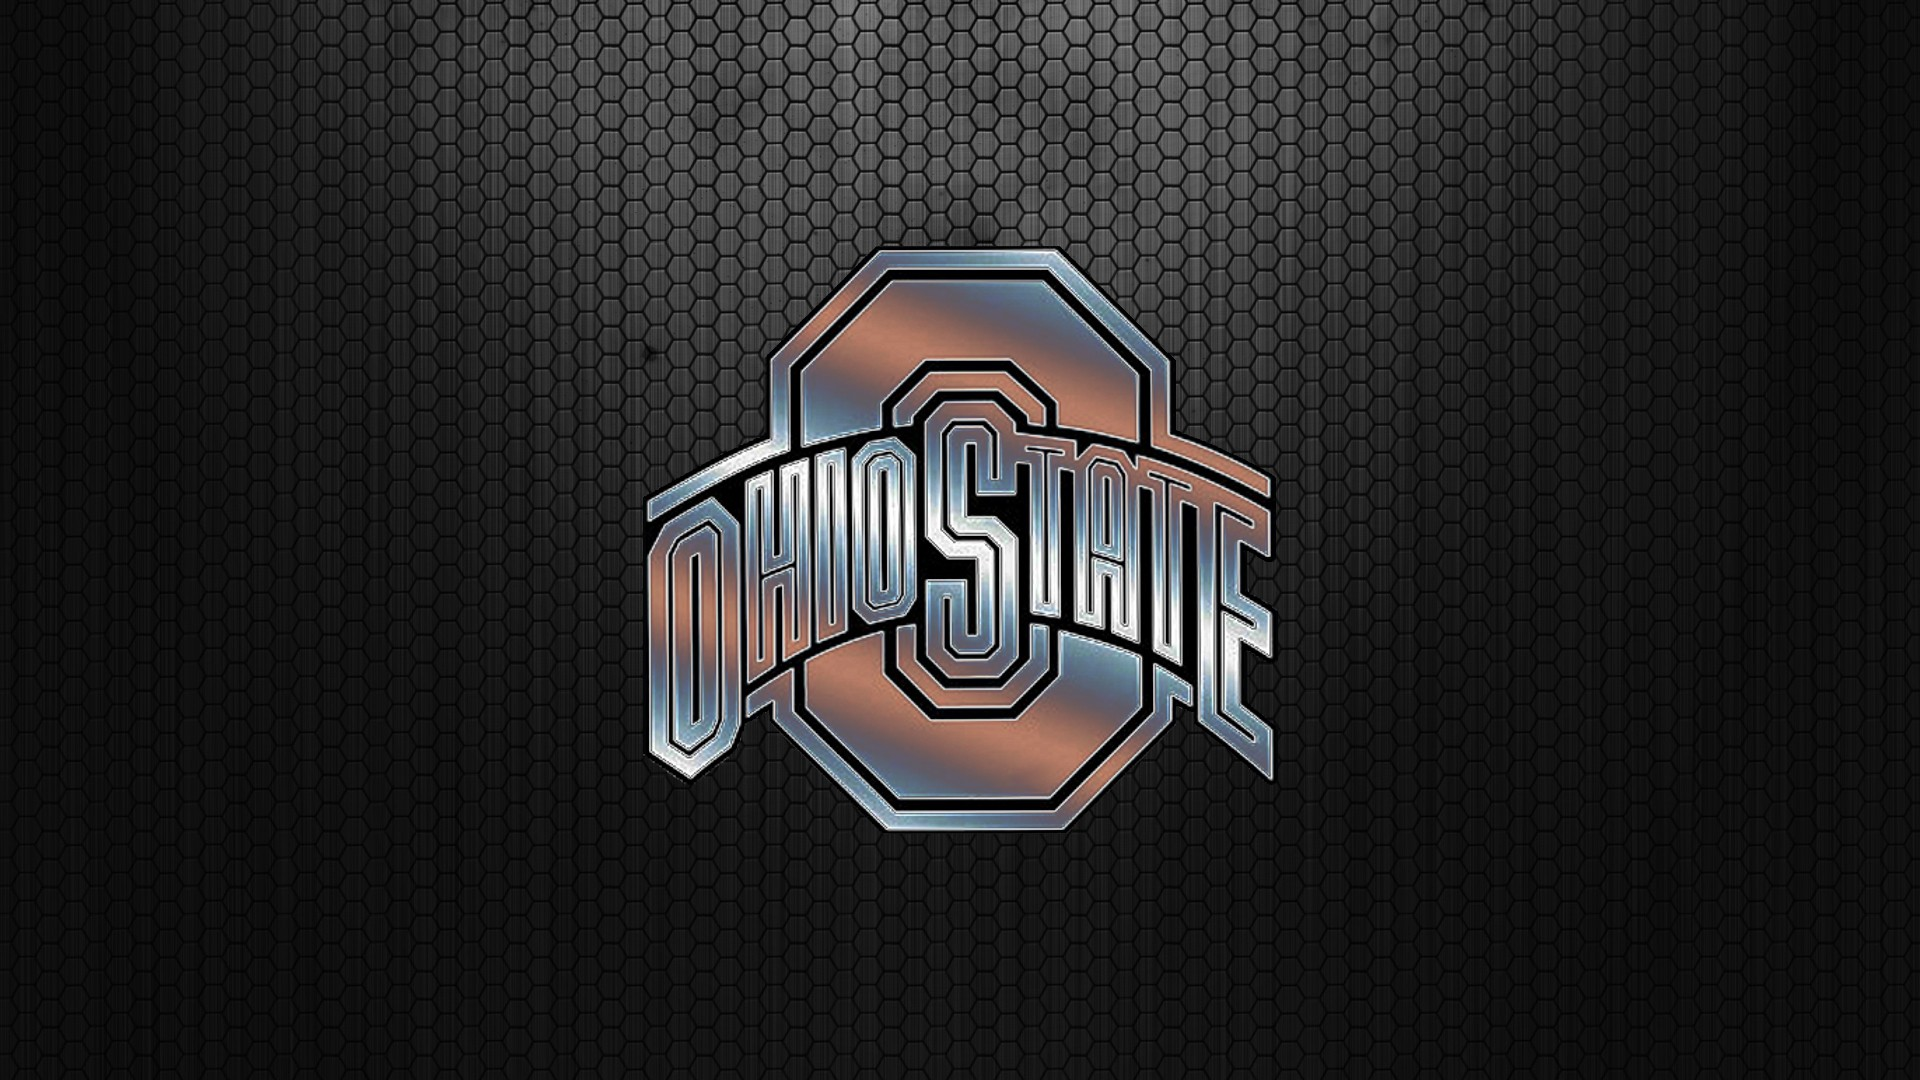 OSU Wallpaper 15 – Ohio State Football Wallpaper (29317581) – Fanpop